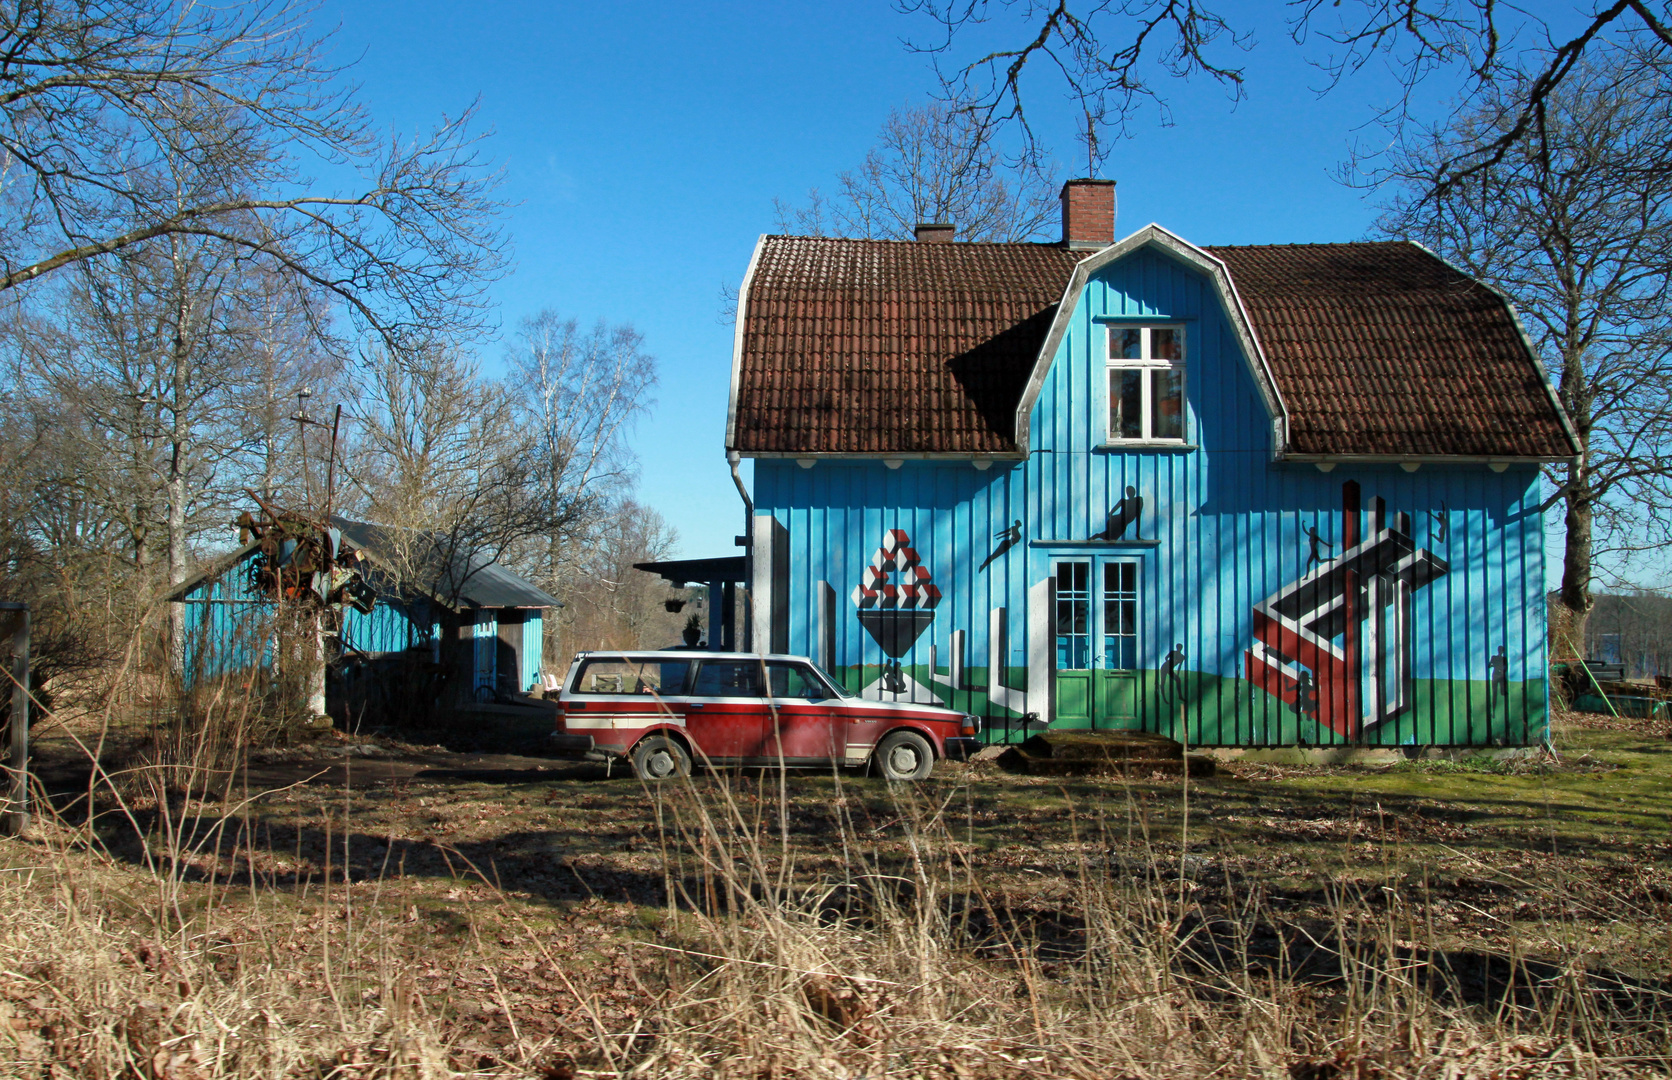 Schweden-Haus - einmal anders